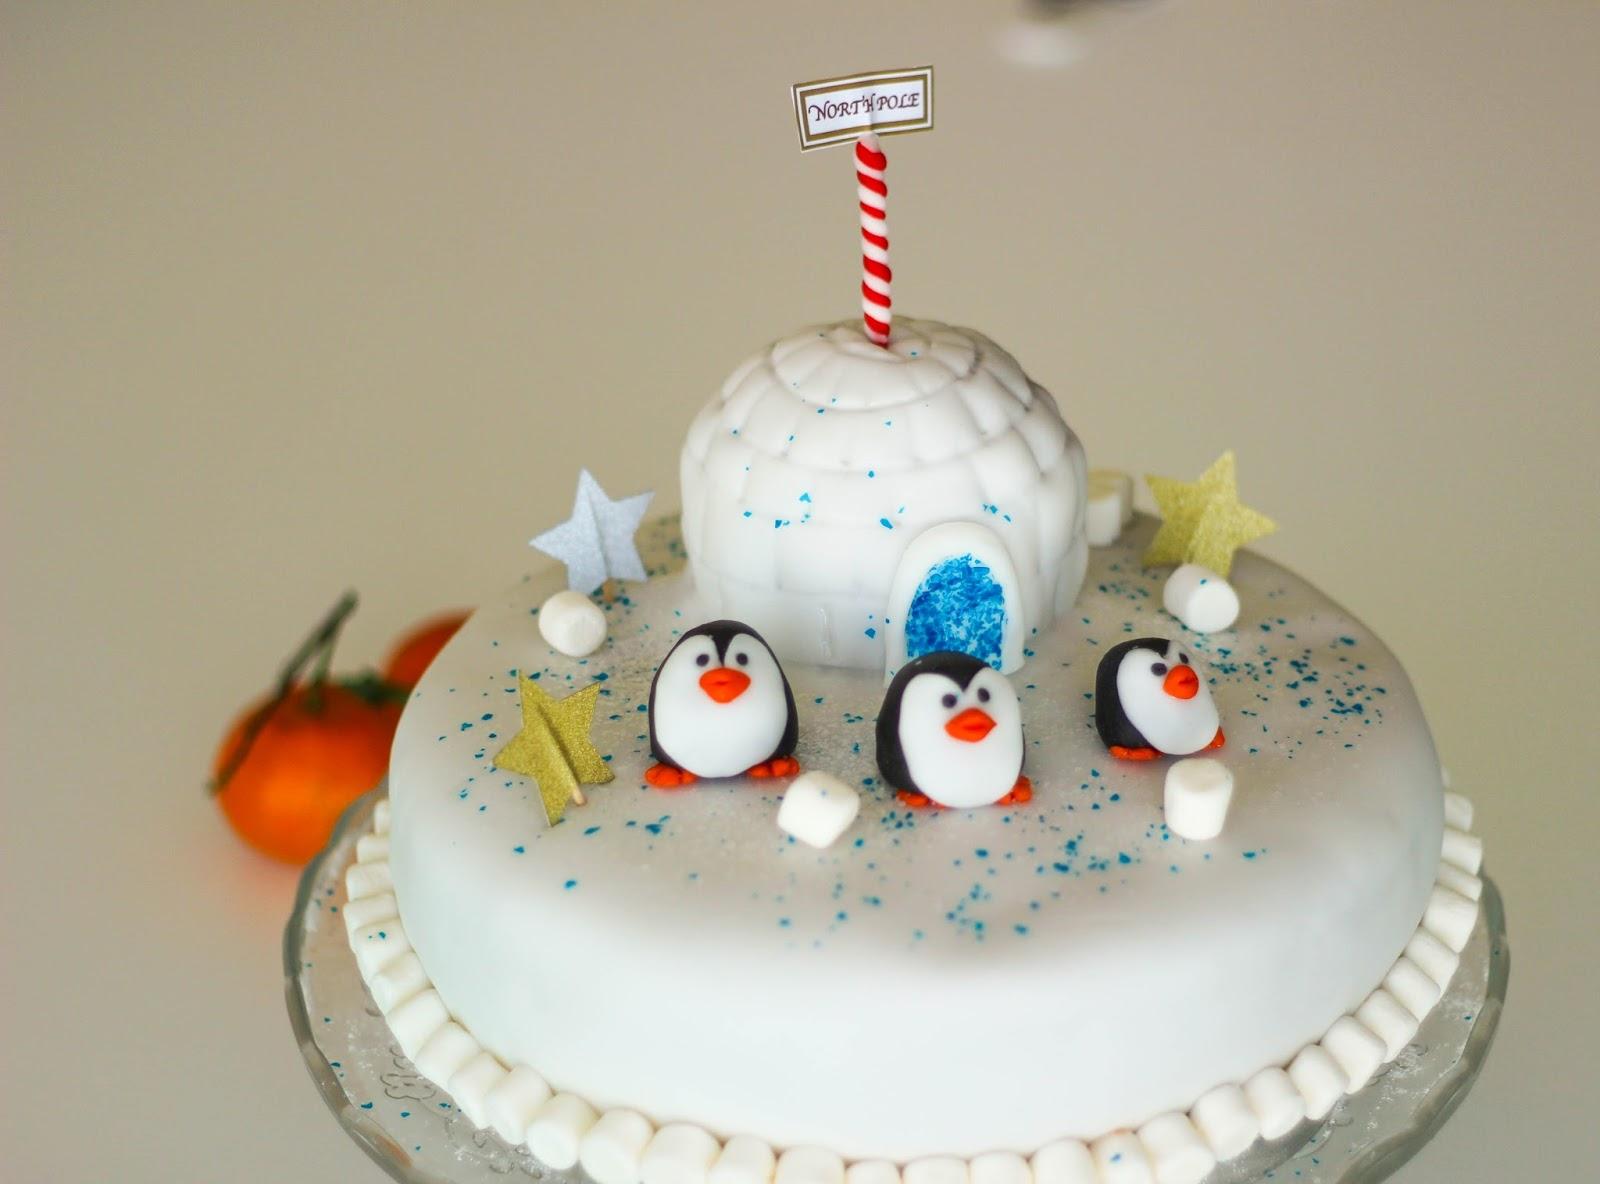 Rizzorizzo Themed Birthday Cakes